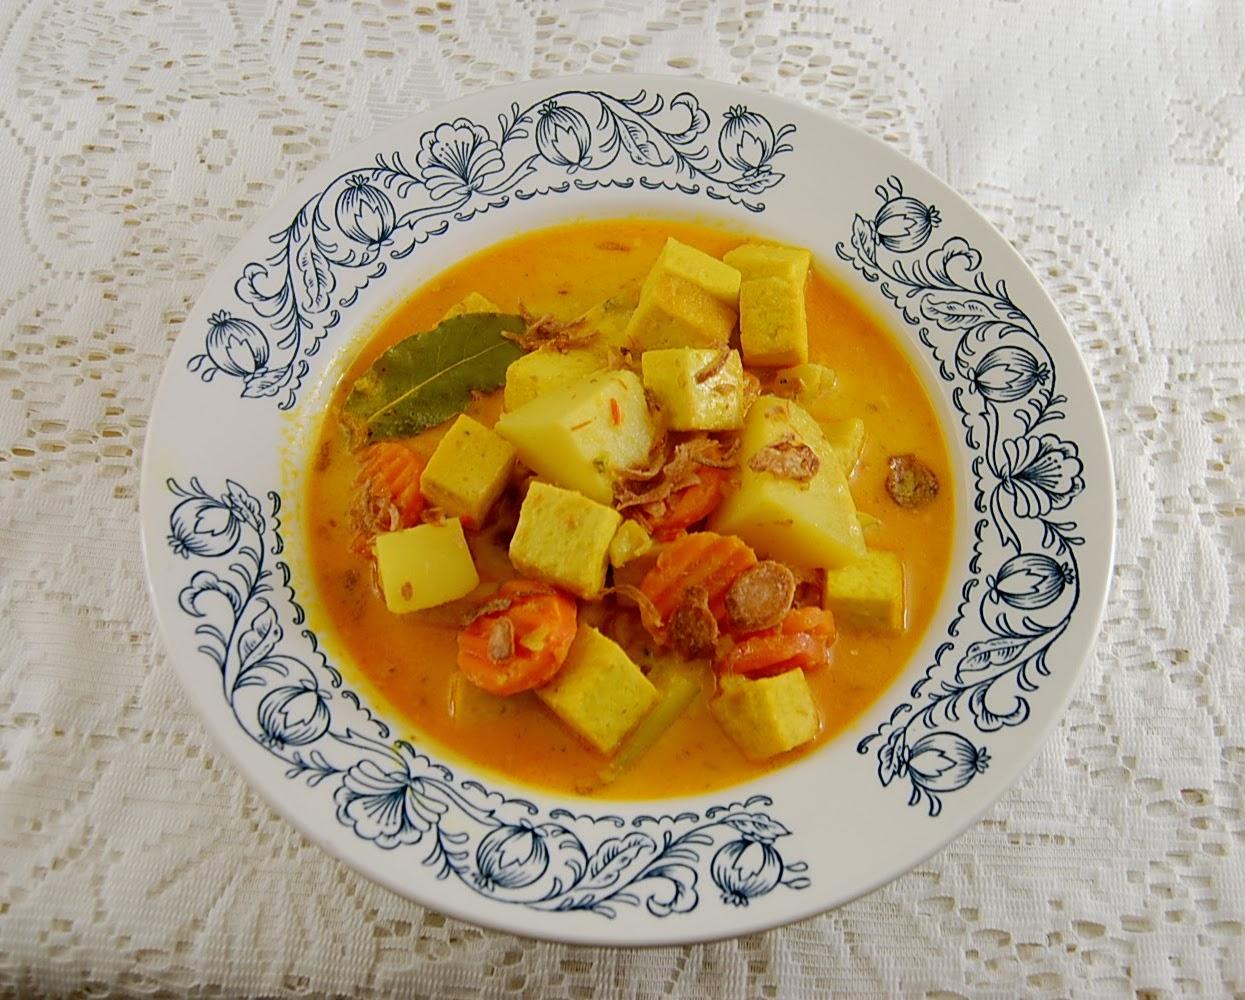 Kartoffel und Tofu mit Sambal Oelek Sauce